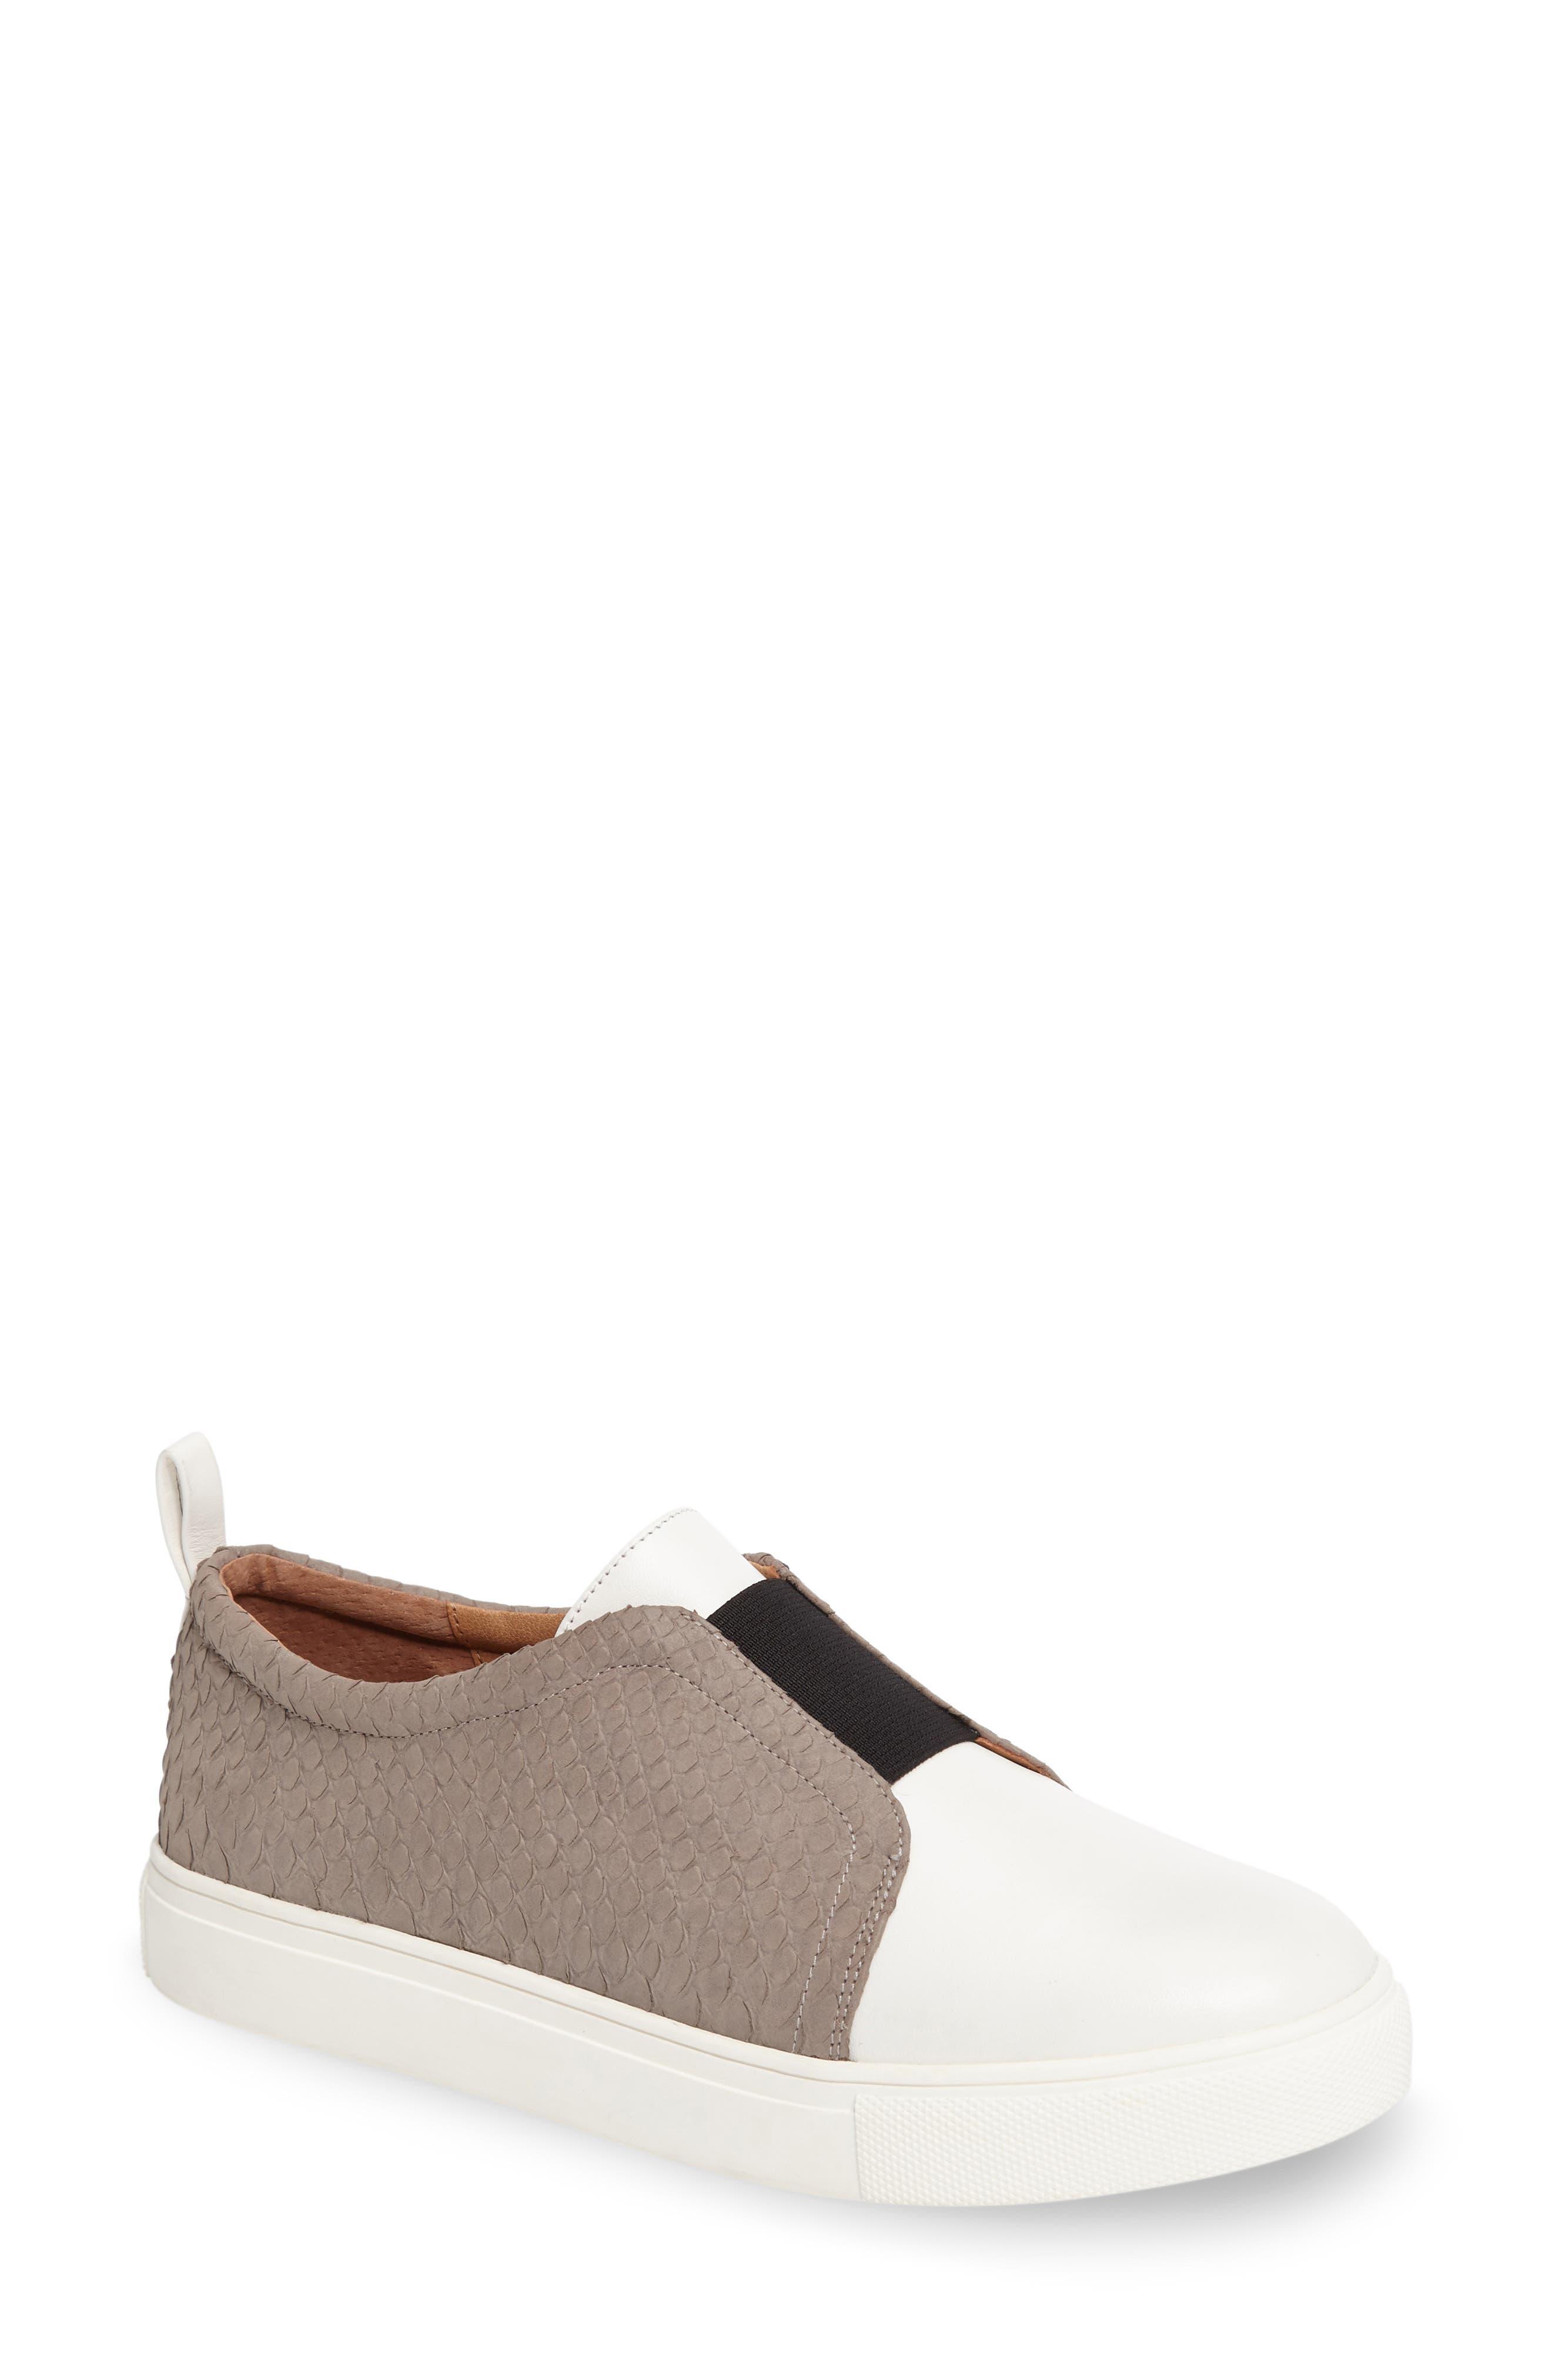 Kyle Slip-On Sneaker,                         Main,                         color, 102